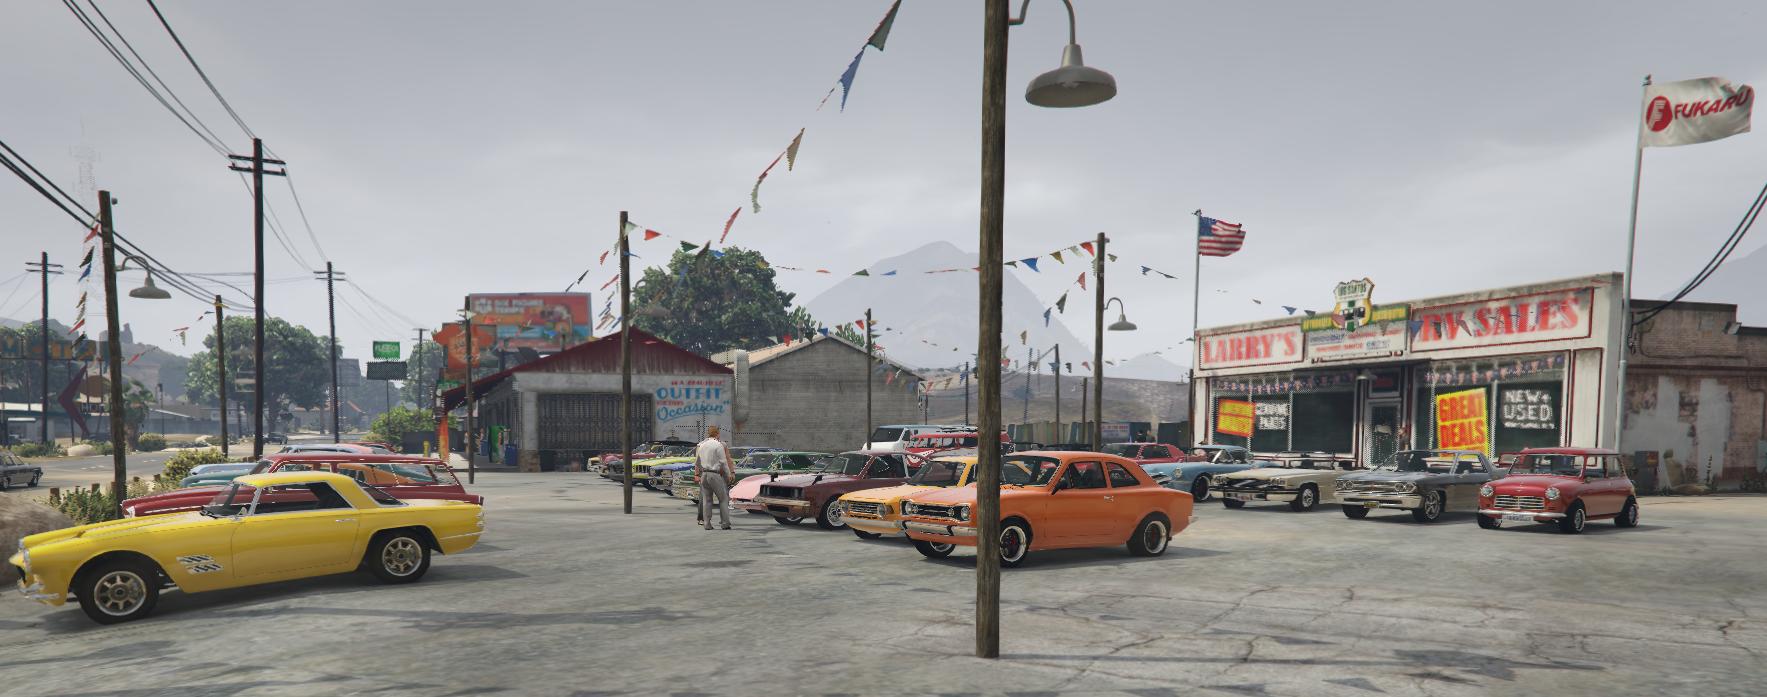 Vintage Cars Dealership Grand Senora Desert Town Gta5